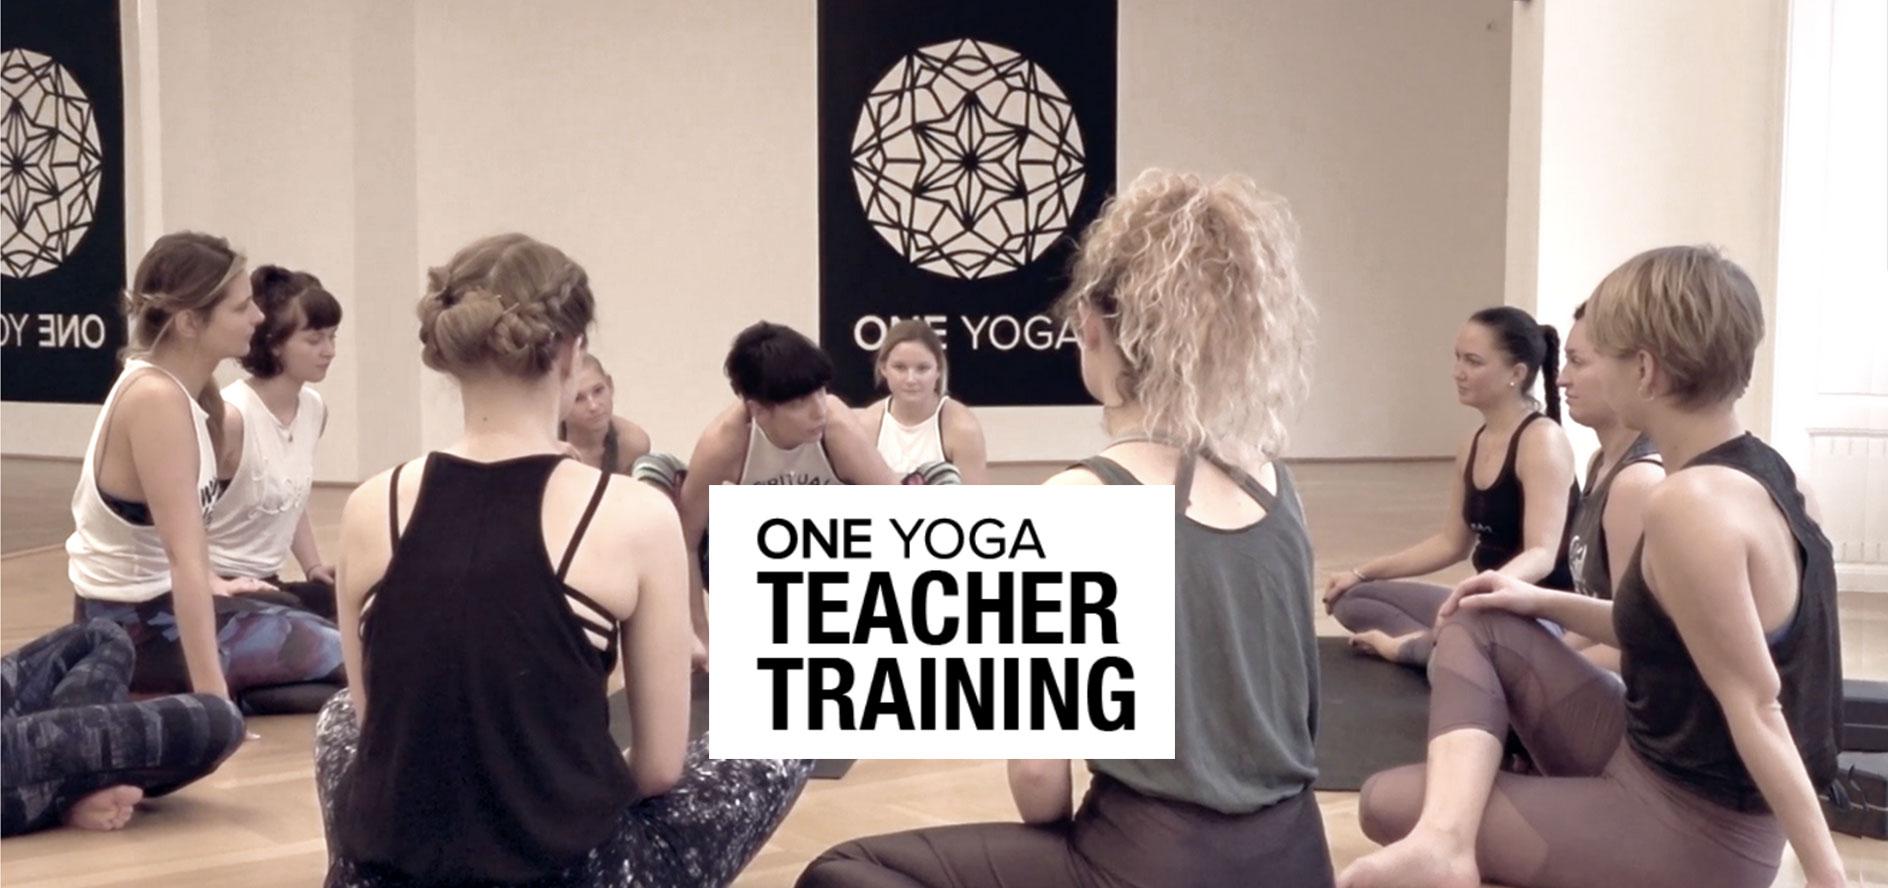 One Yoga Teacher Training